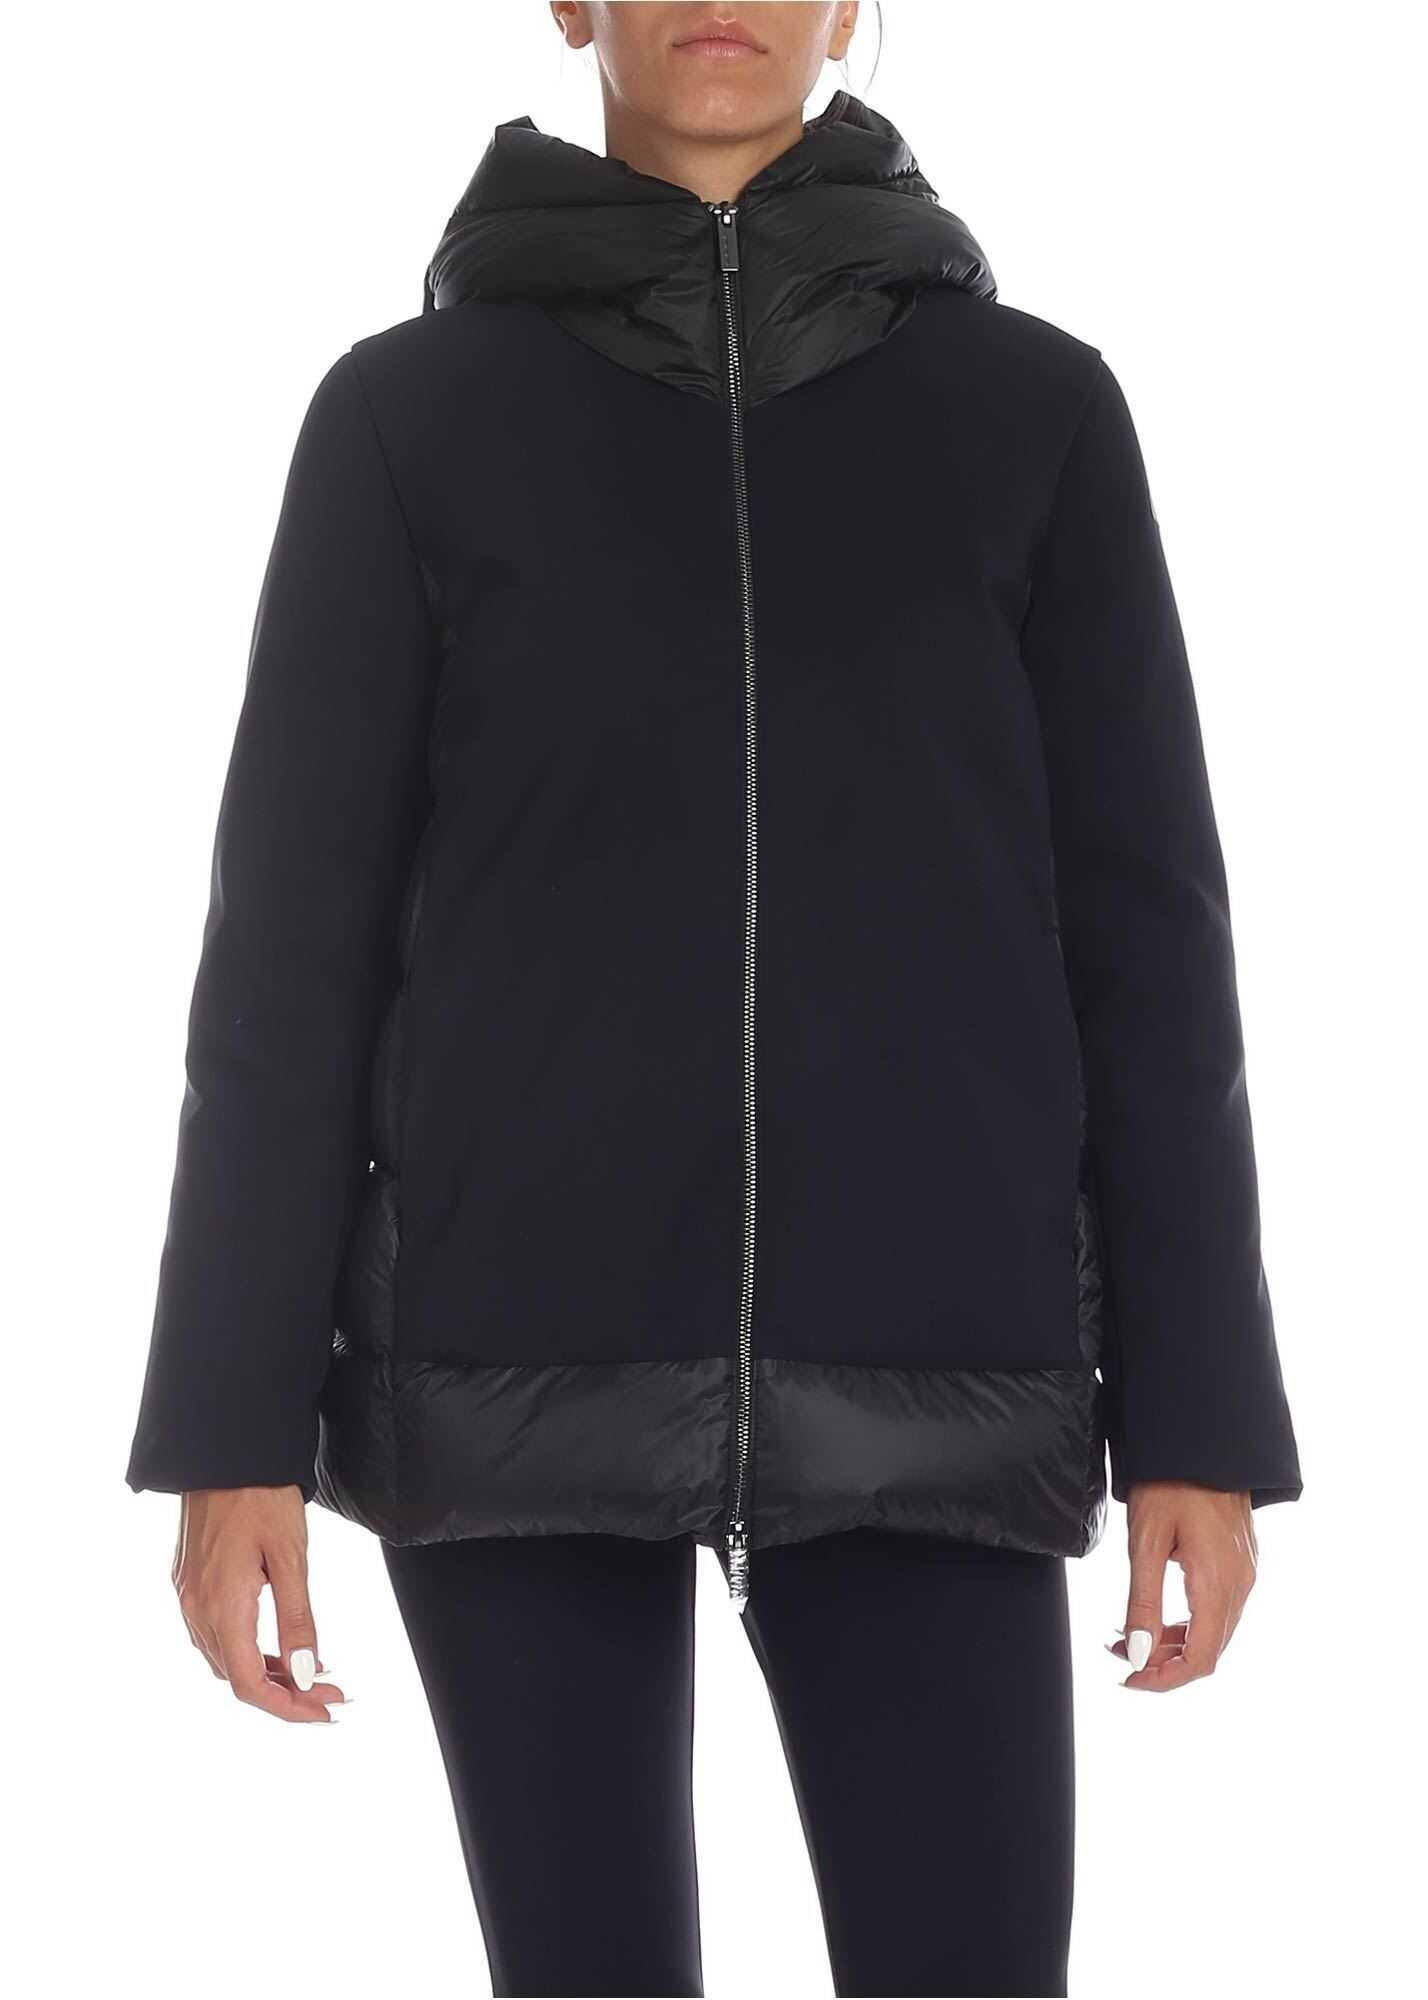 RRD Roberto Ricci Designs Winter Hybrid Zar Jacket In Black Black